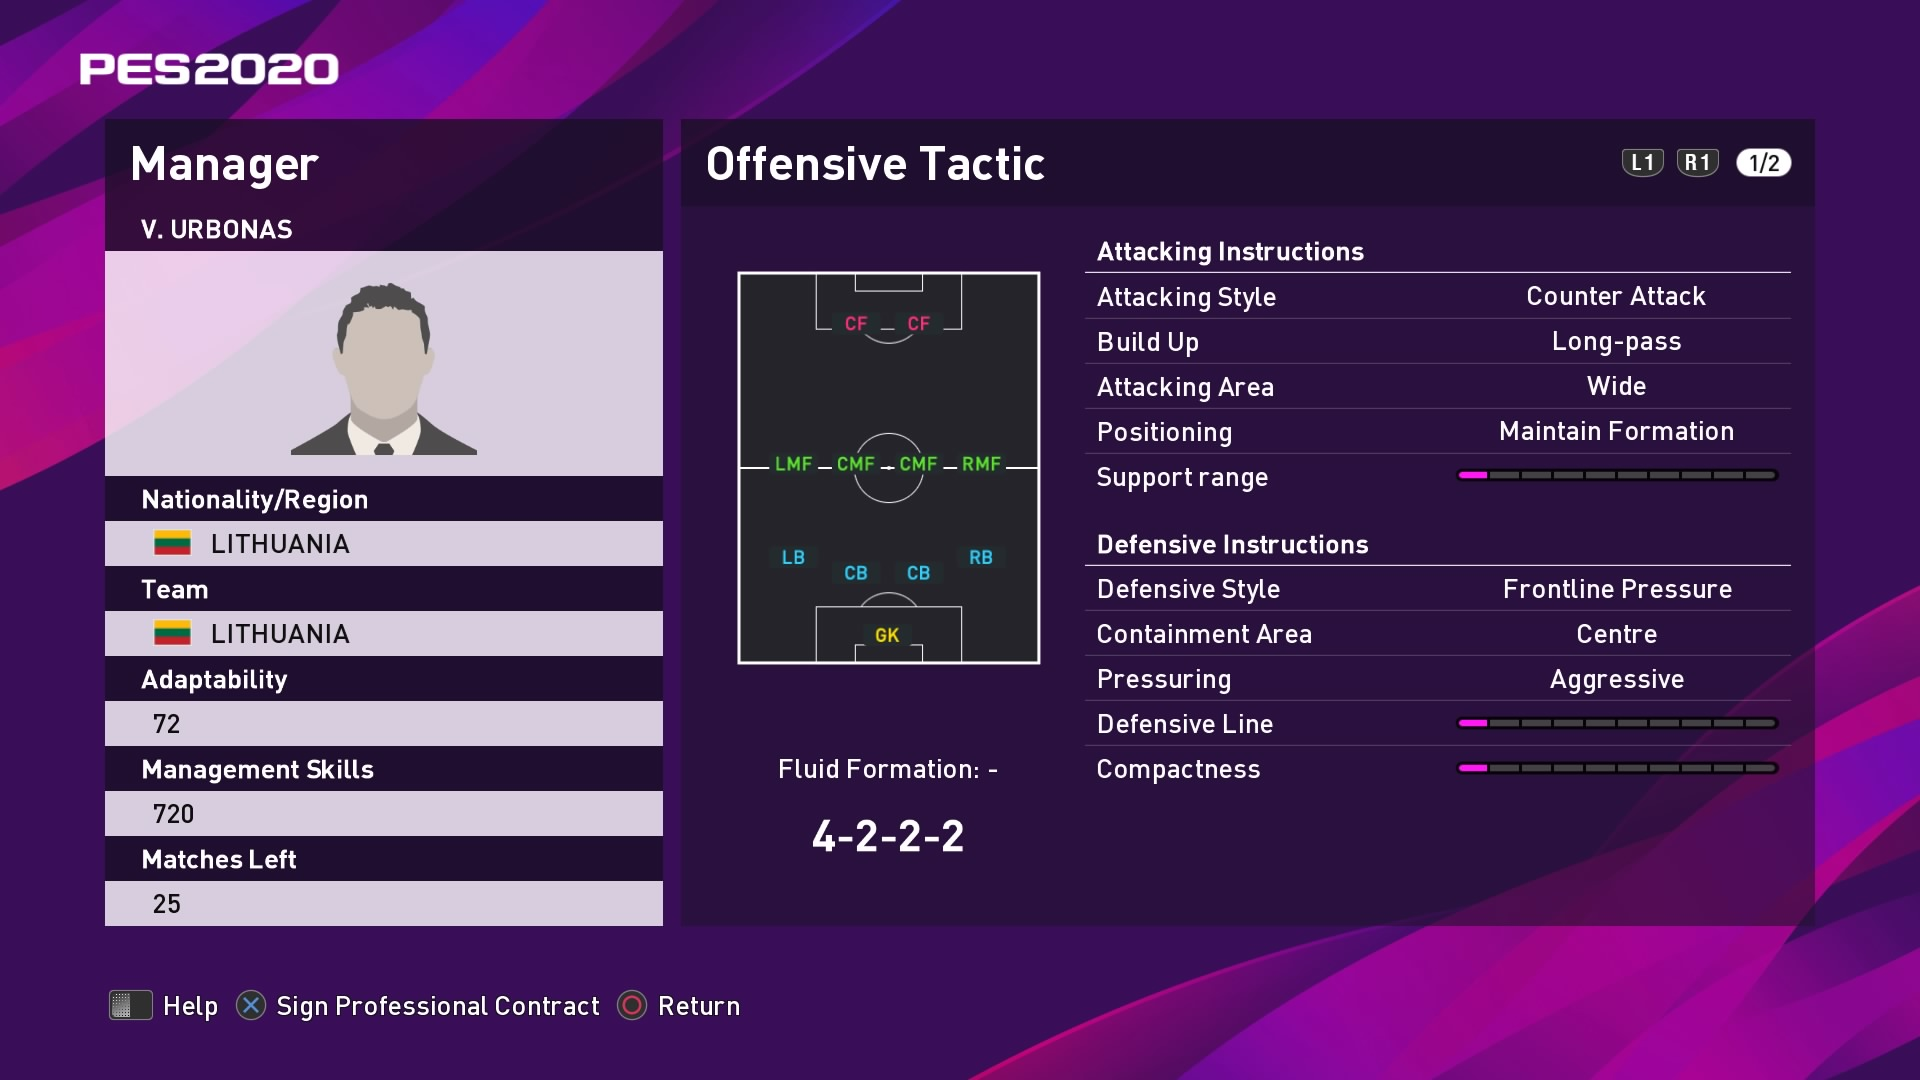 V. Urbonas (Valdas Urbonas) Offensive Tactic in PES 2020 myClub